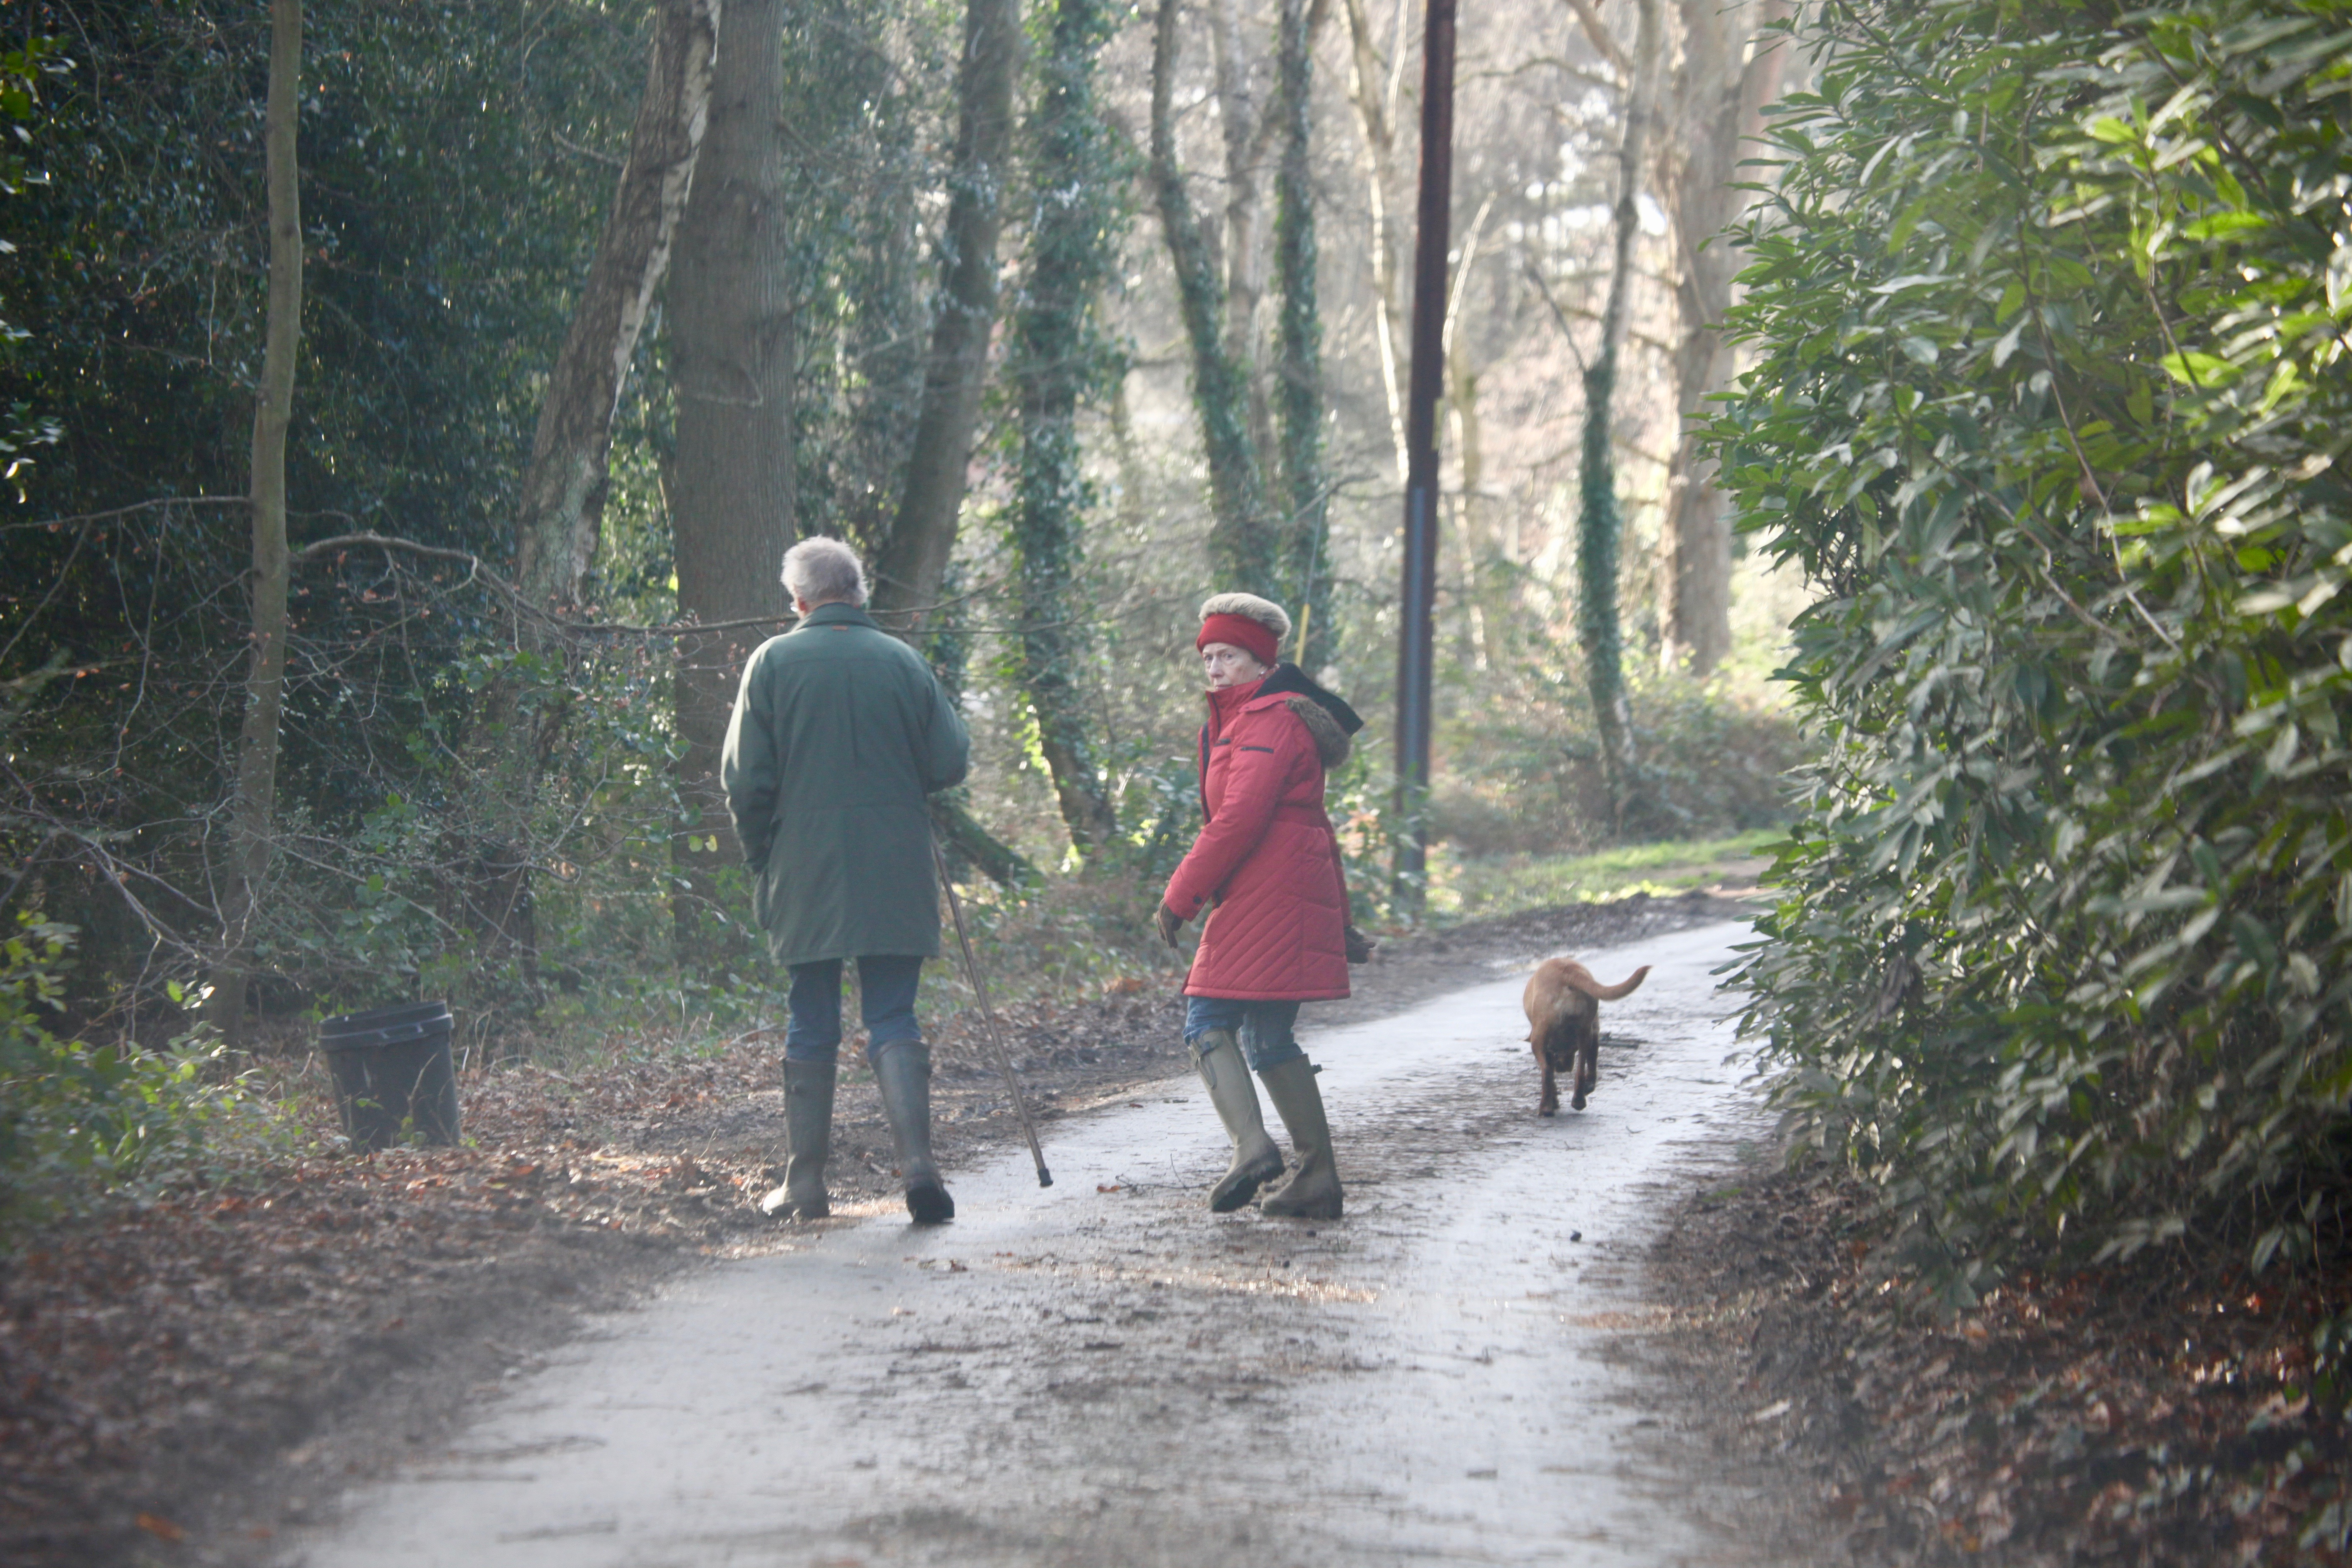 Dog walkers on lane